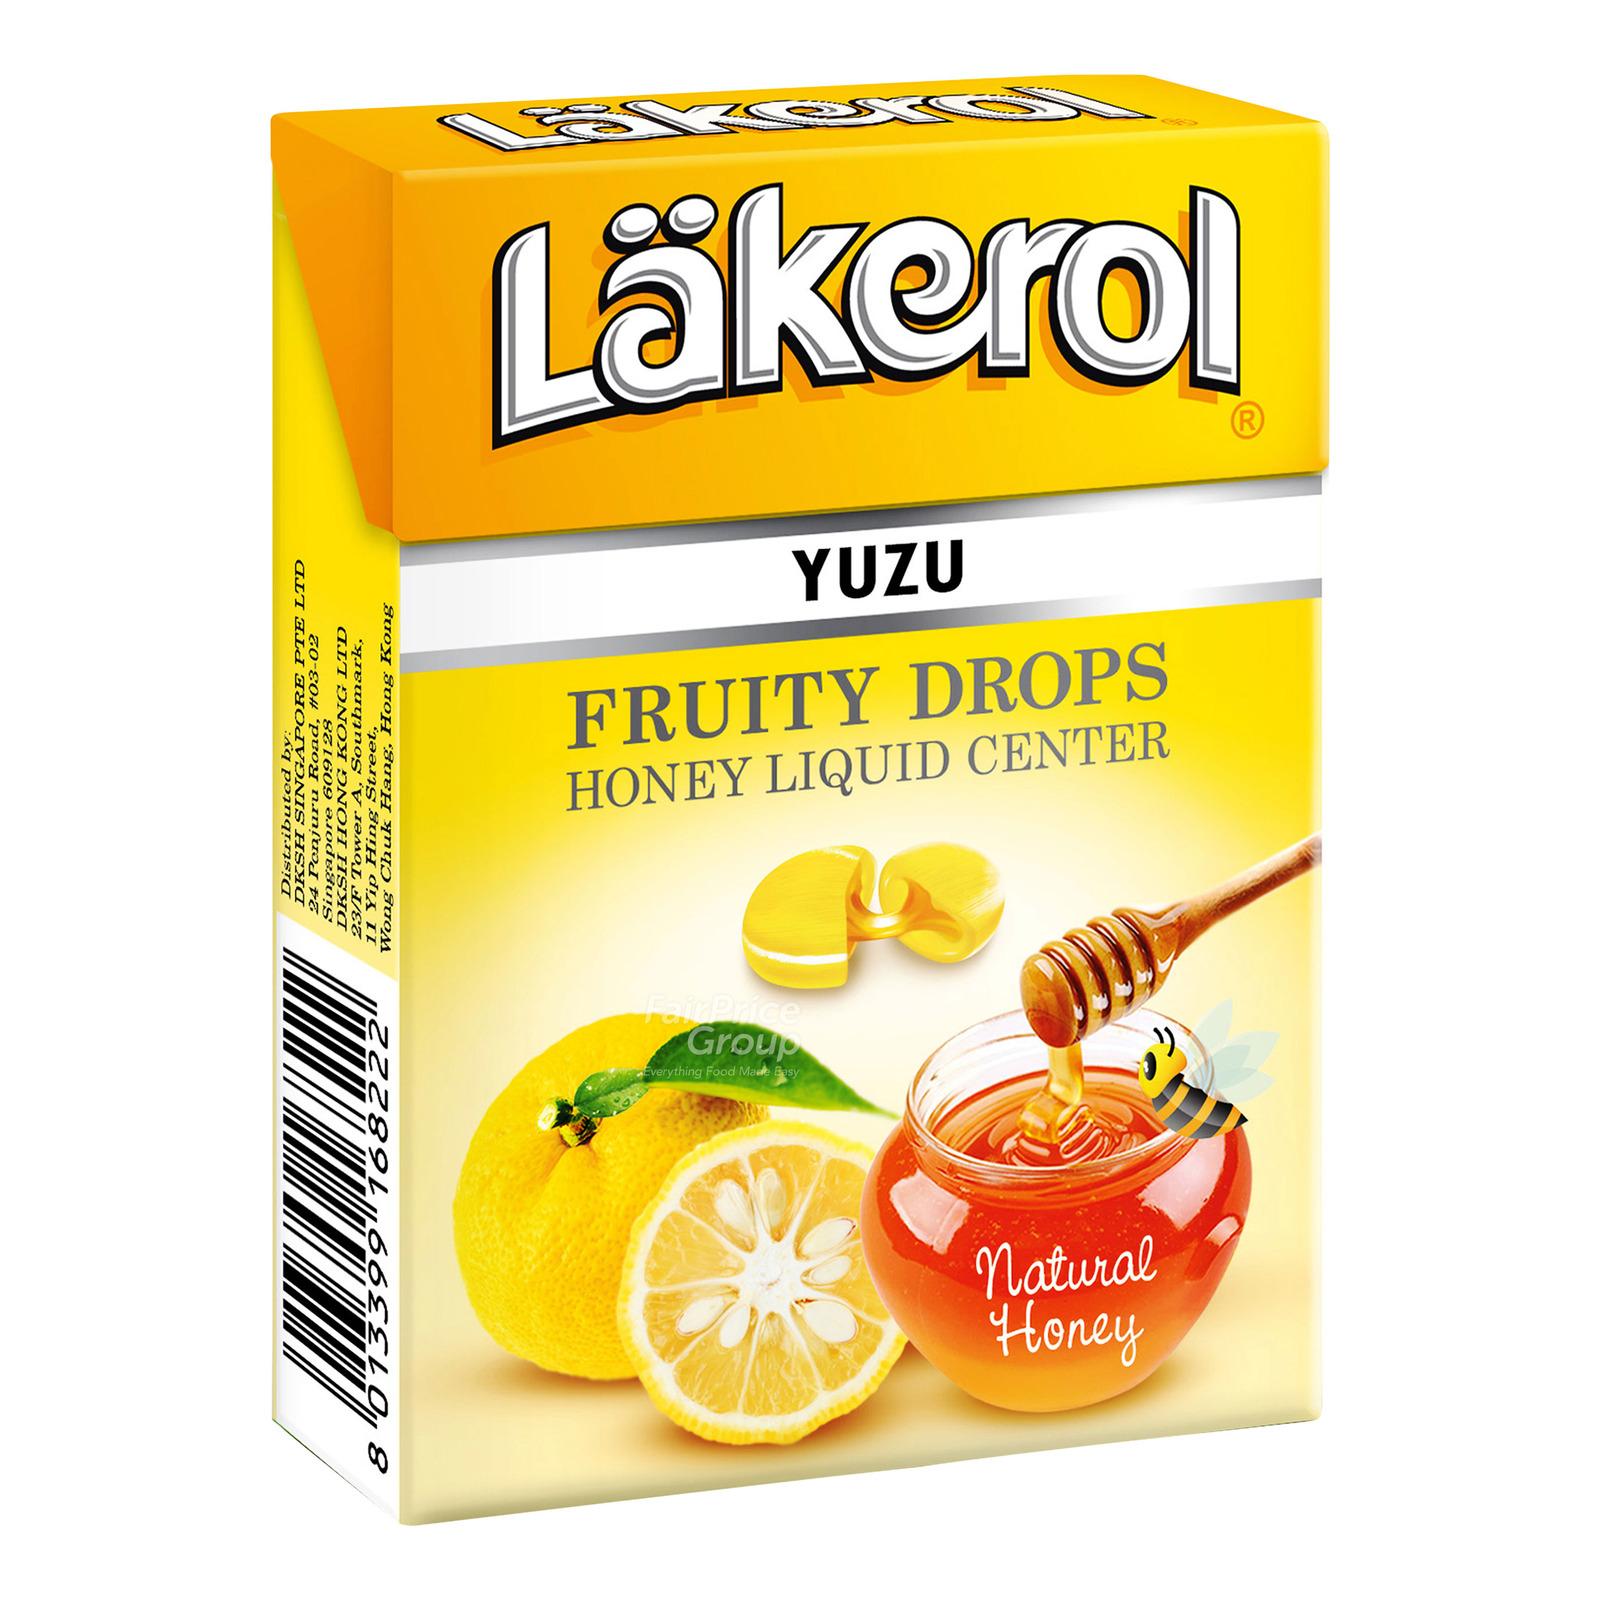 Lakerol Fruity Drops - Yuzu with Honey